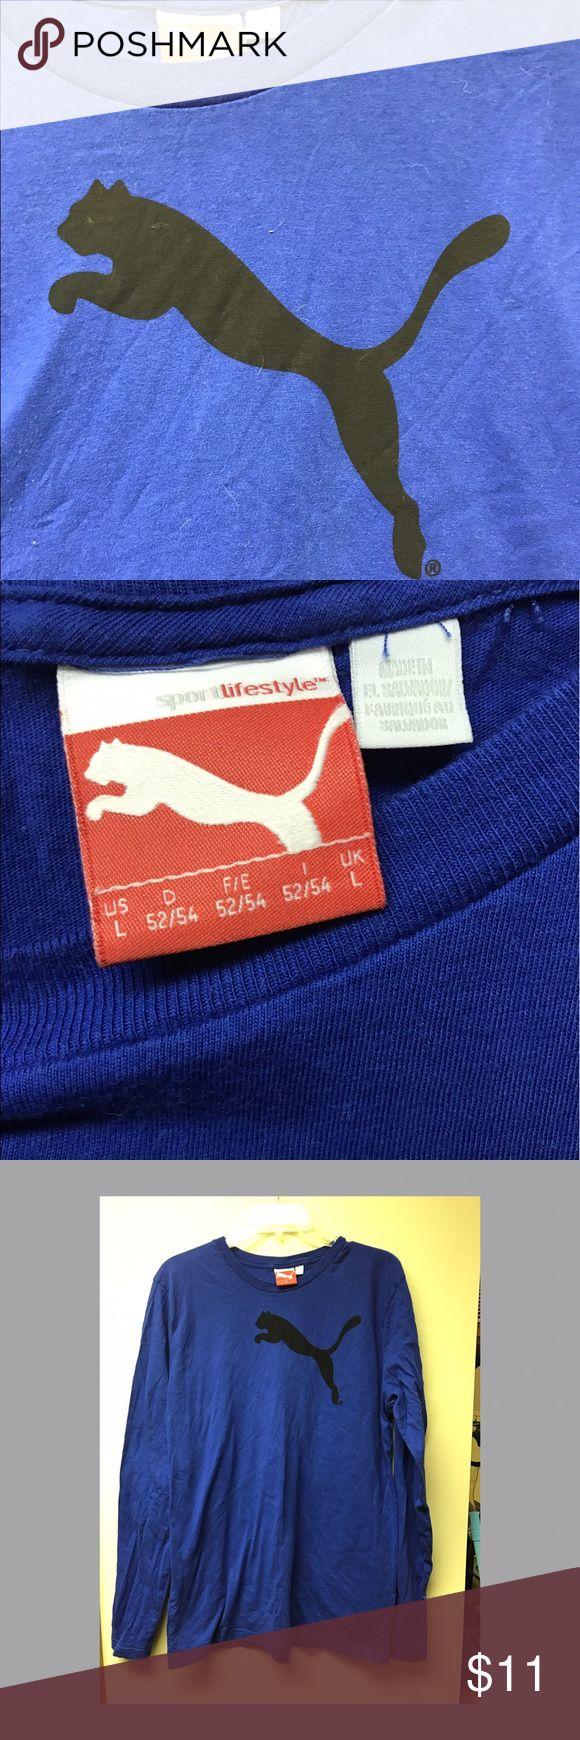 Men's Royal blue puma long sleeve shirt Large men's royal blue puma shirt. Only worn once! Puma Shirts Tees - Long Sleeve